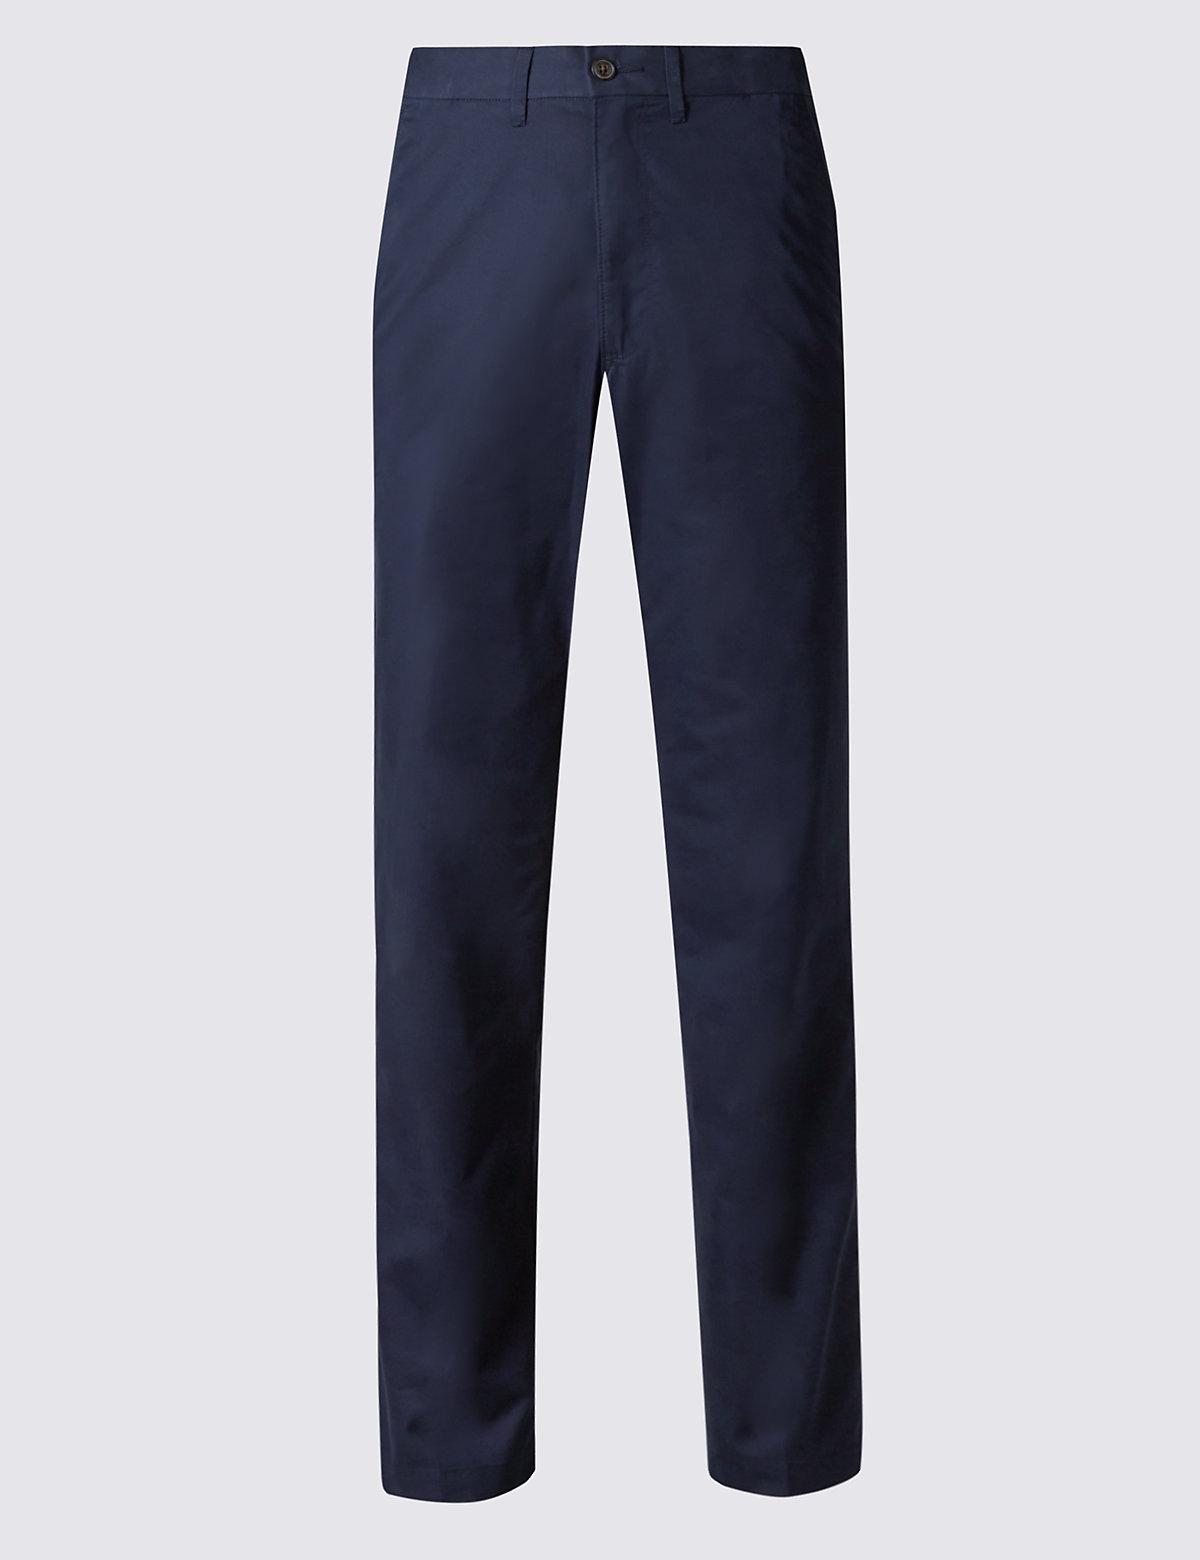 Классические брюки чинос Super Lightweight M&S Collection. Цвет: темно-синий